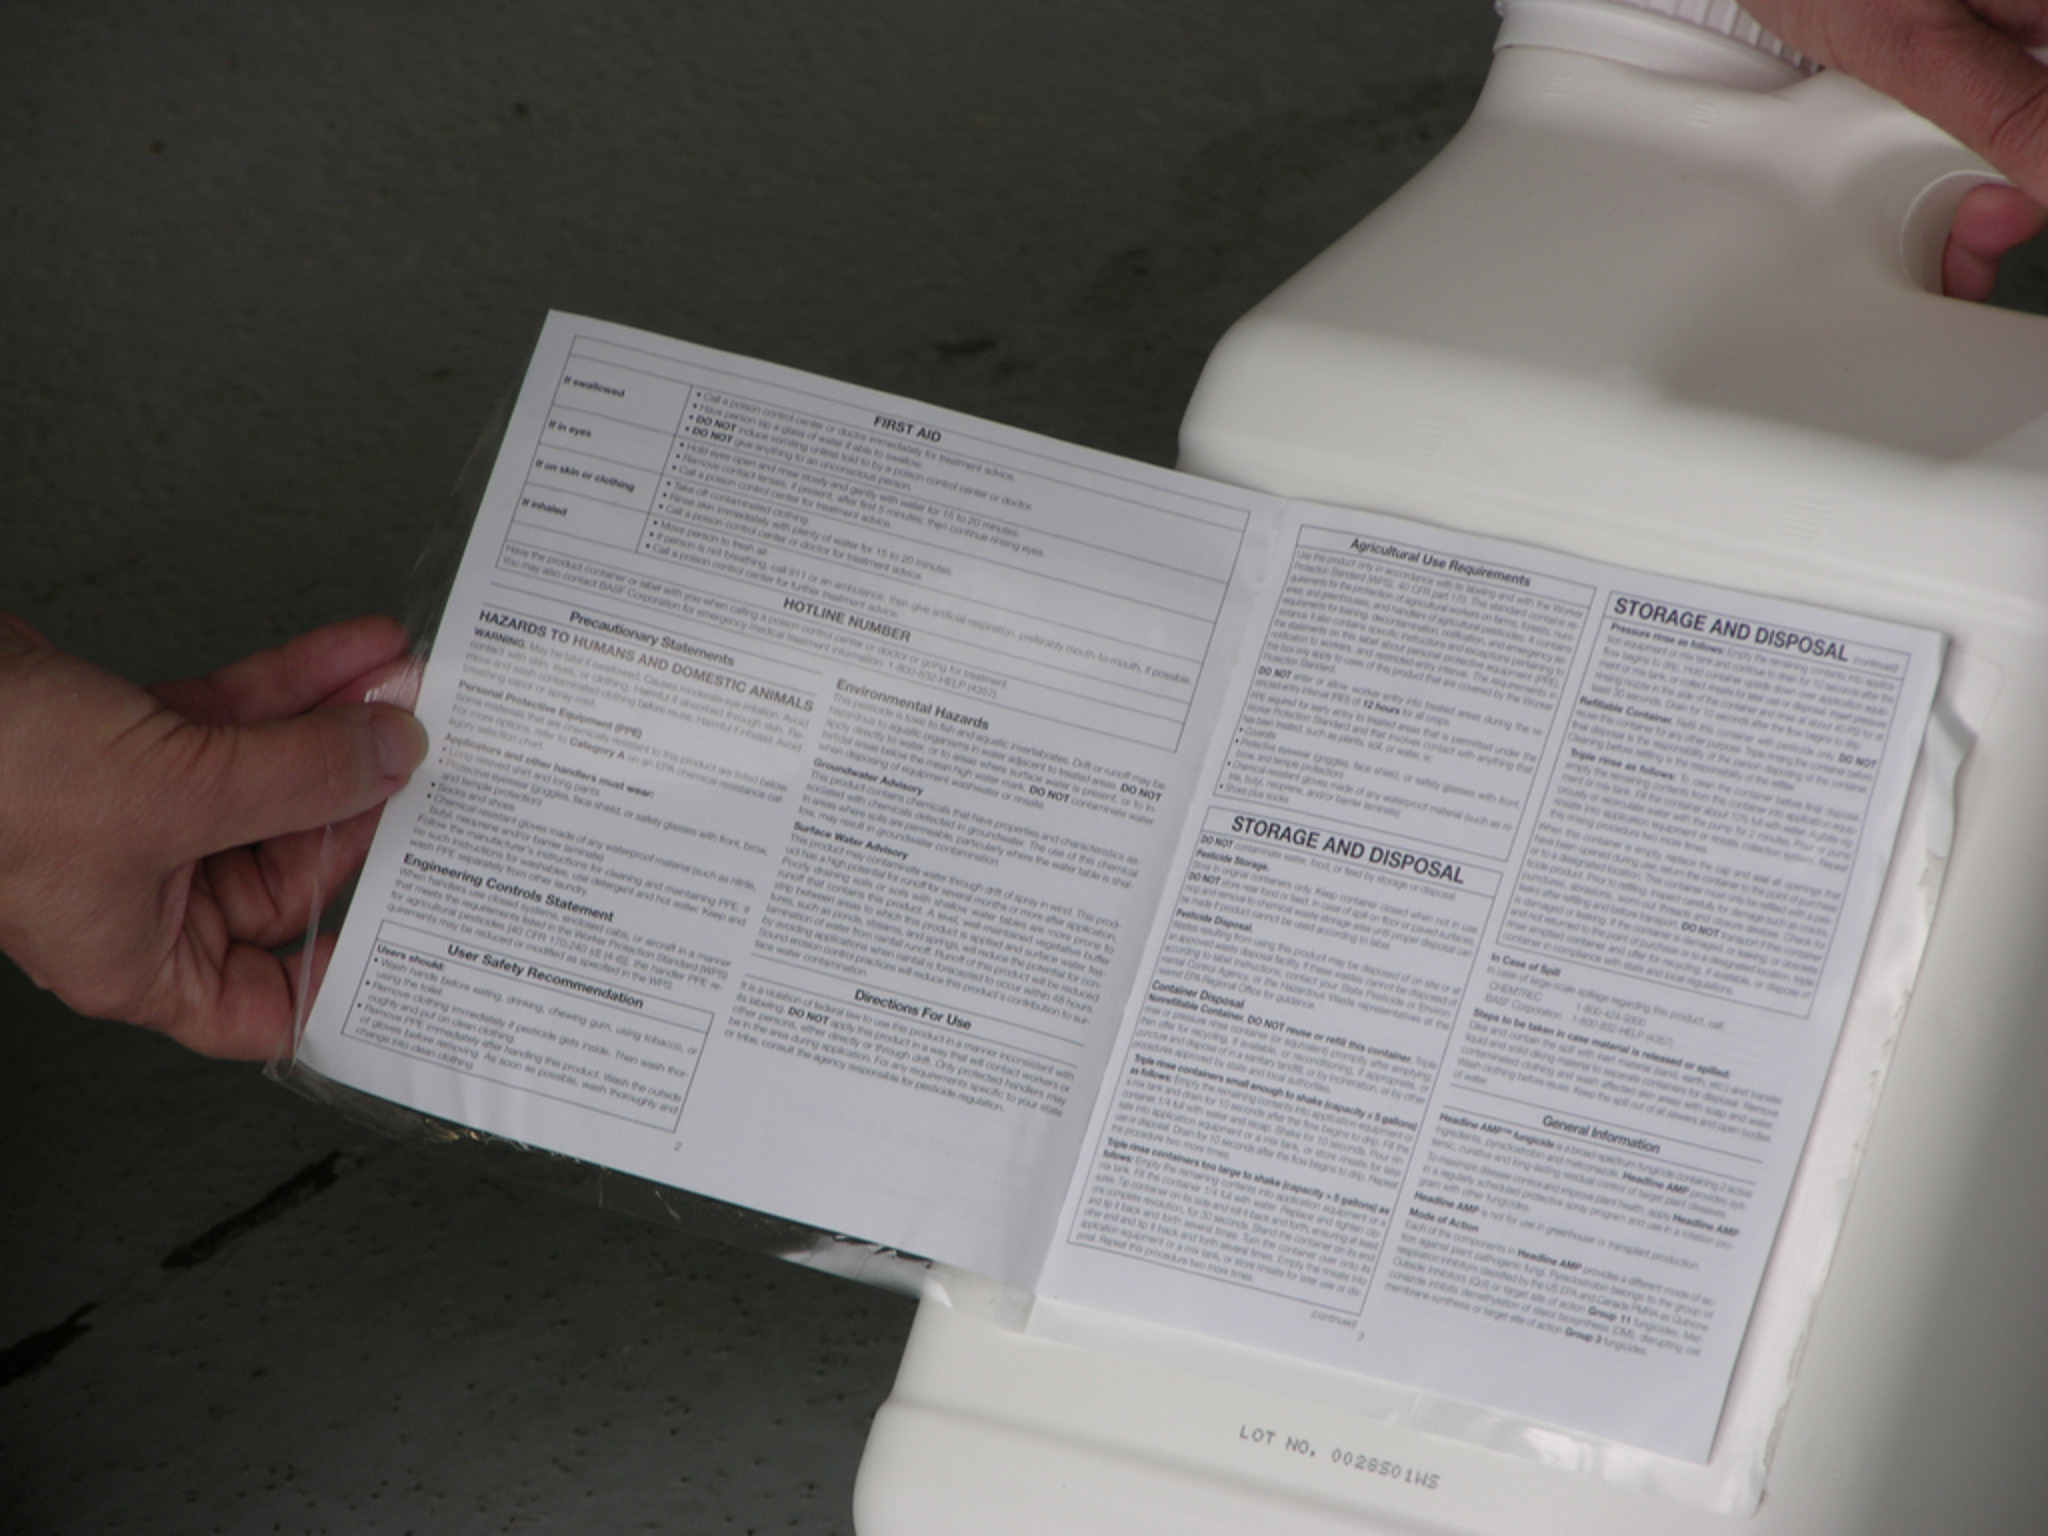 Pesticide Label showing Storage Requirements